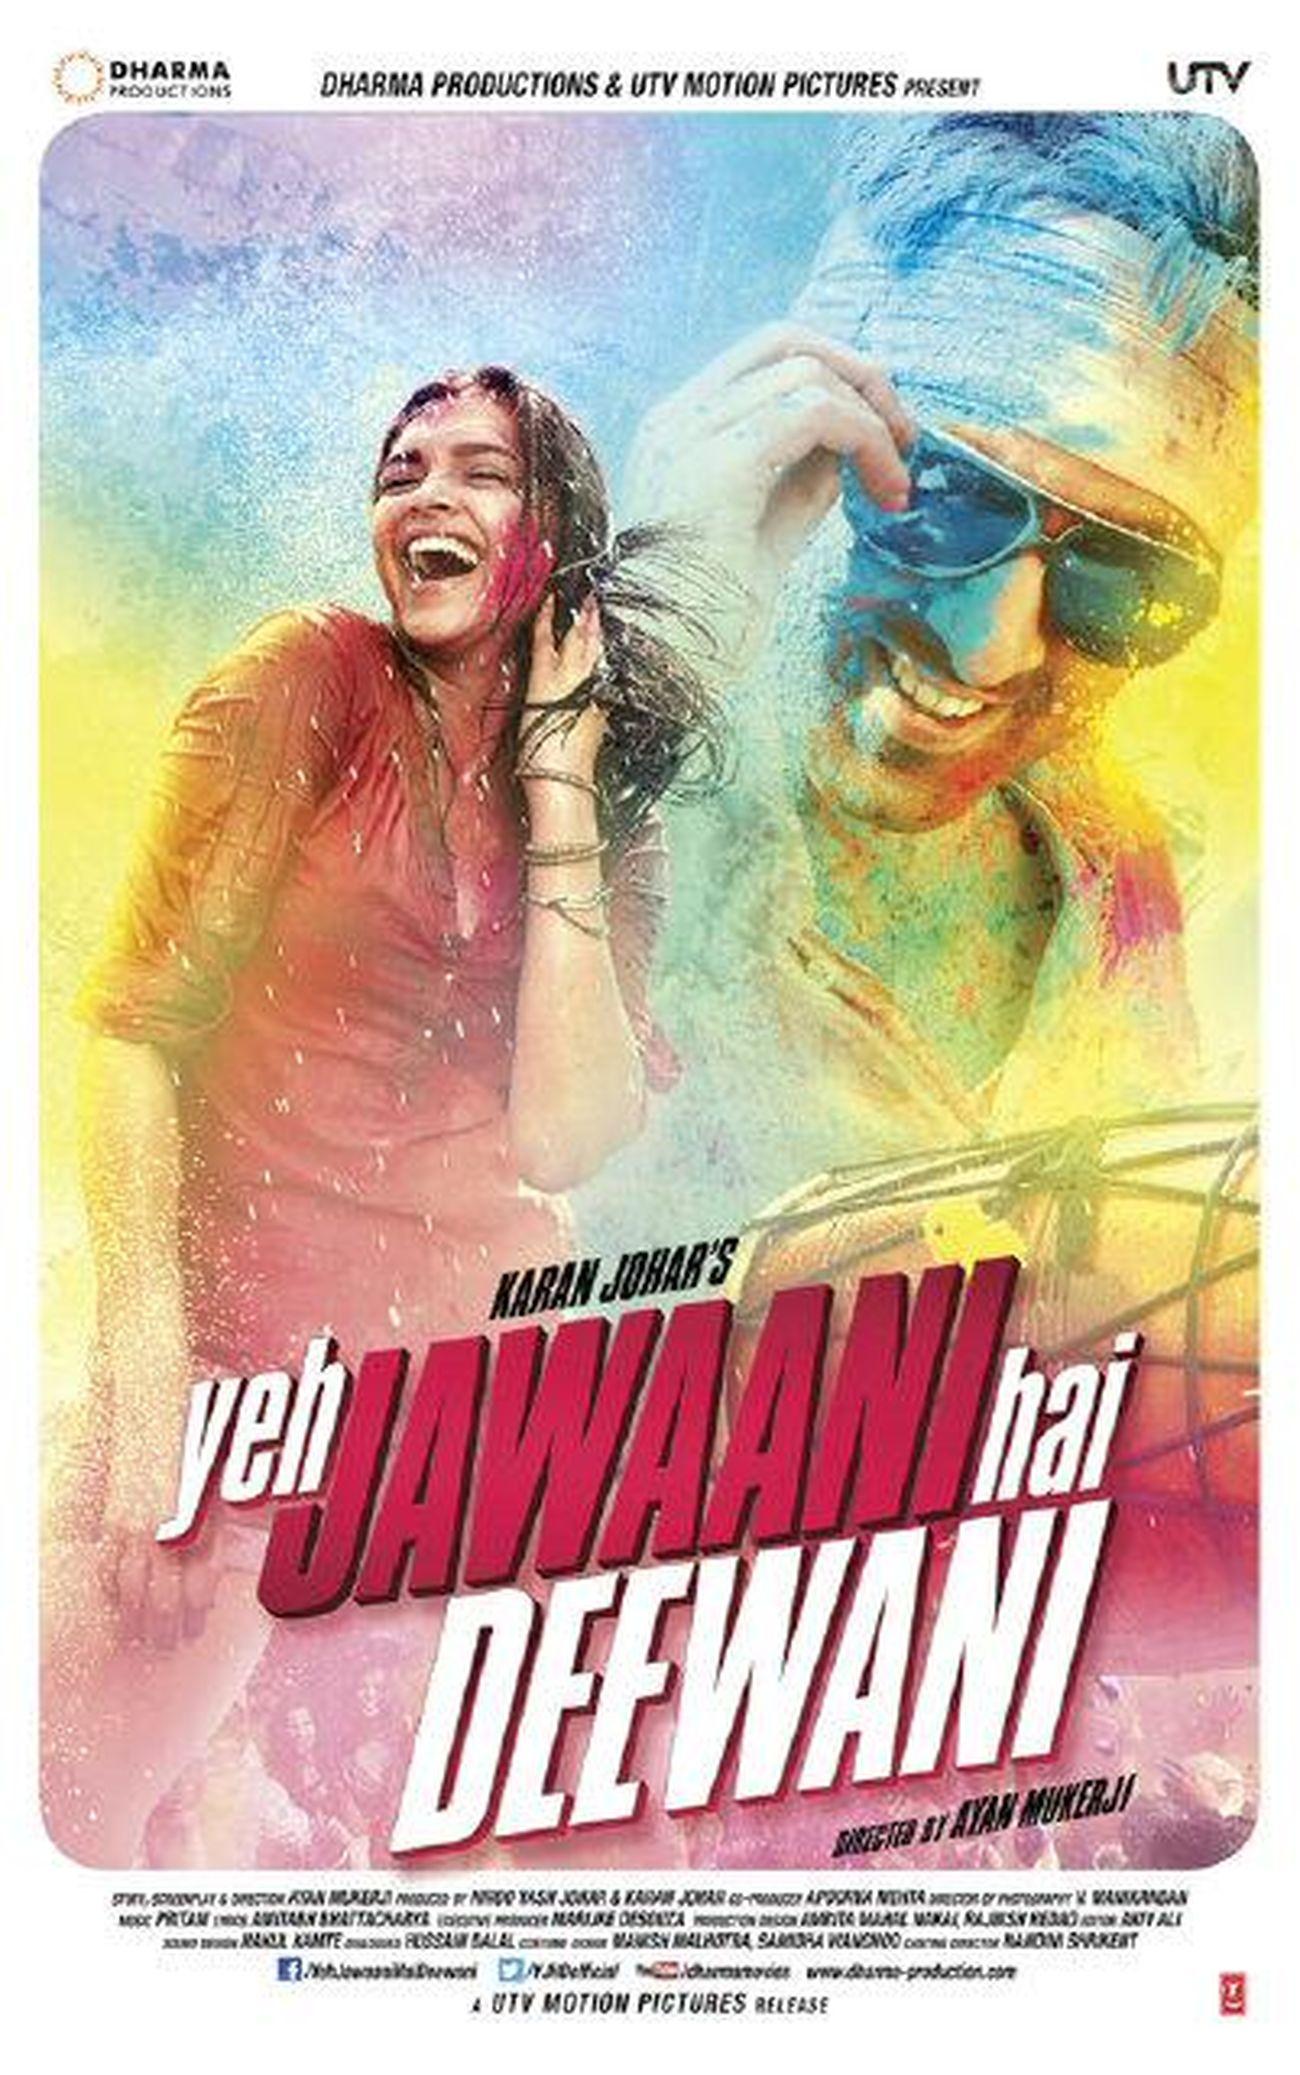 ranbir kapoor's highest grossed film, 301crores Ranbir Kapoor